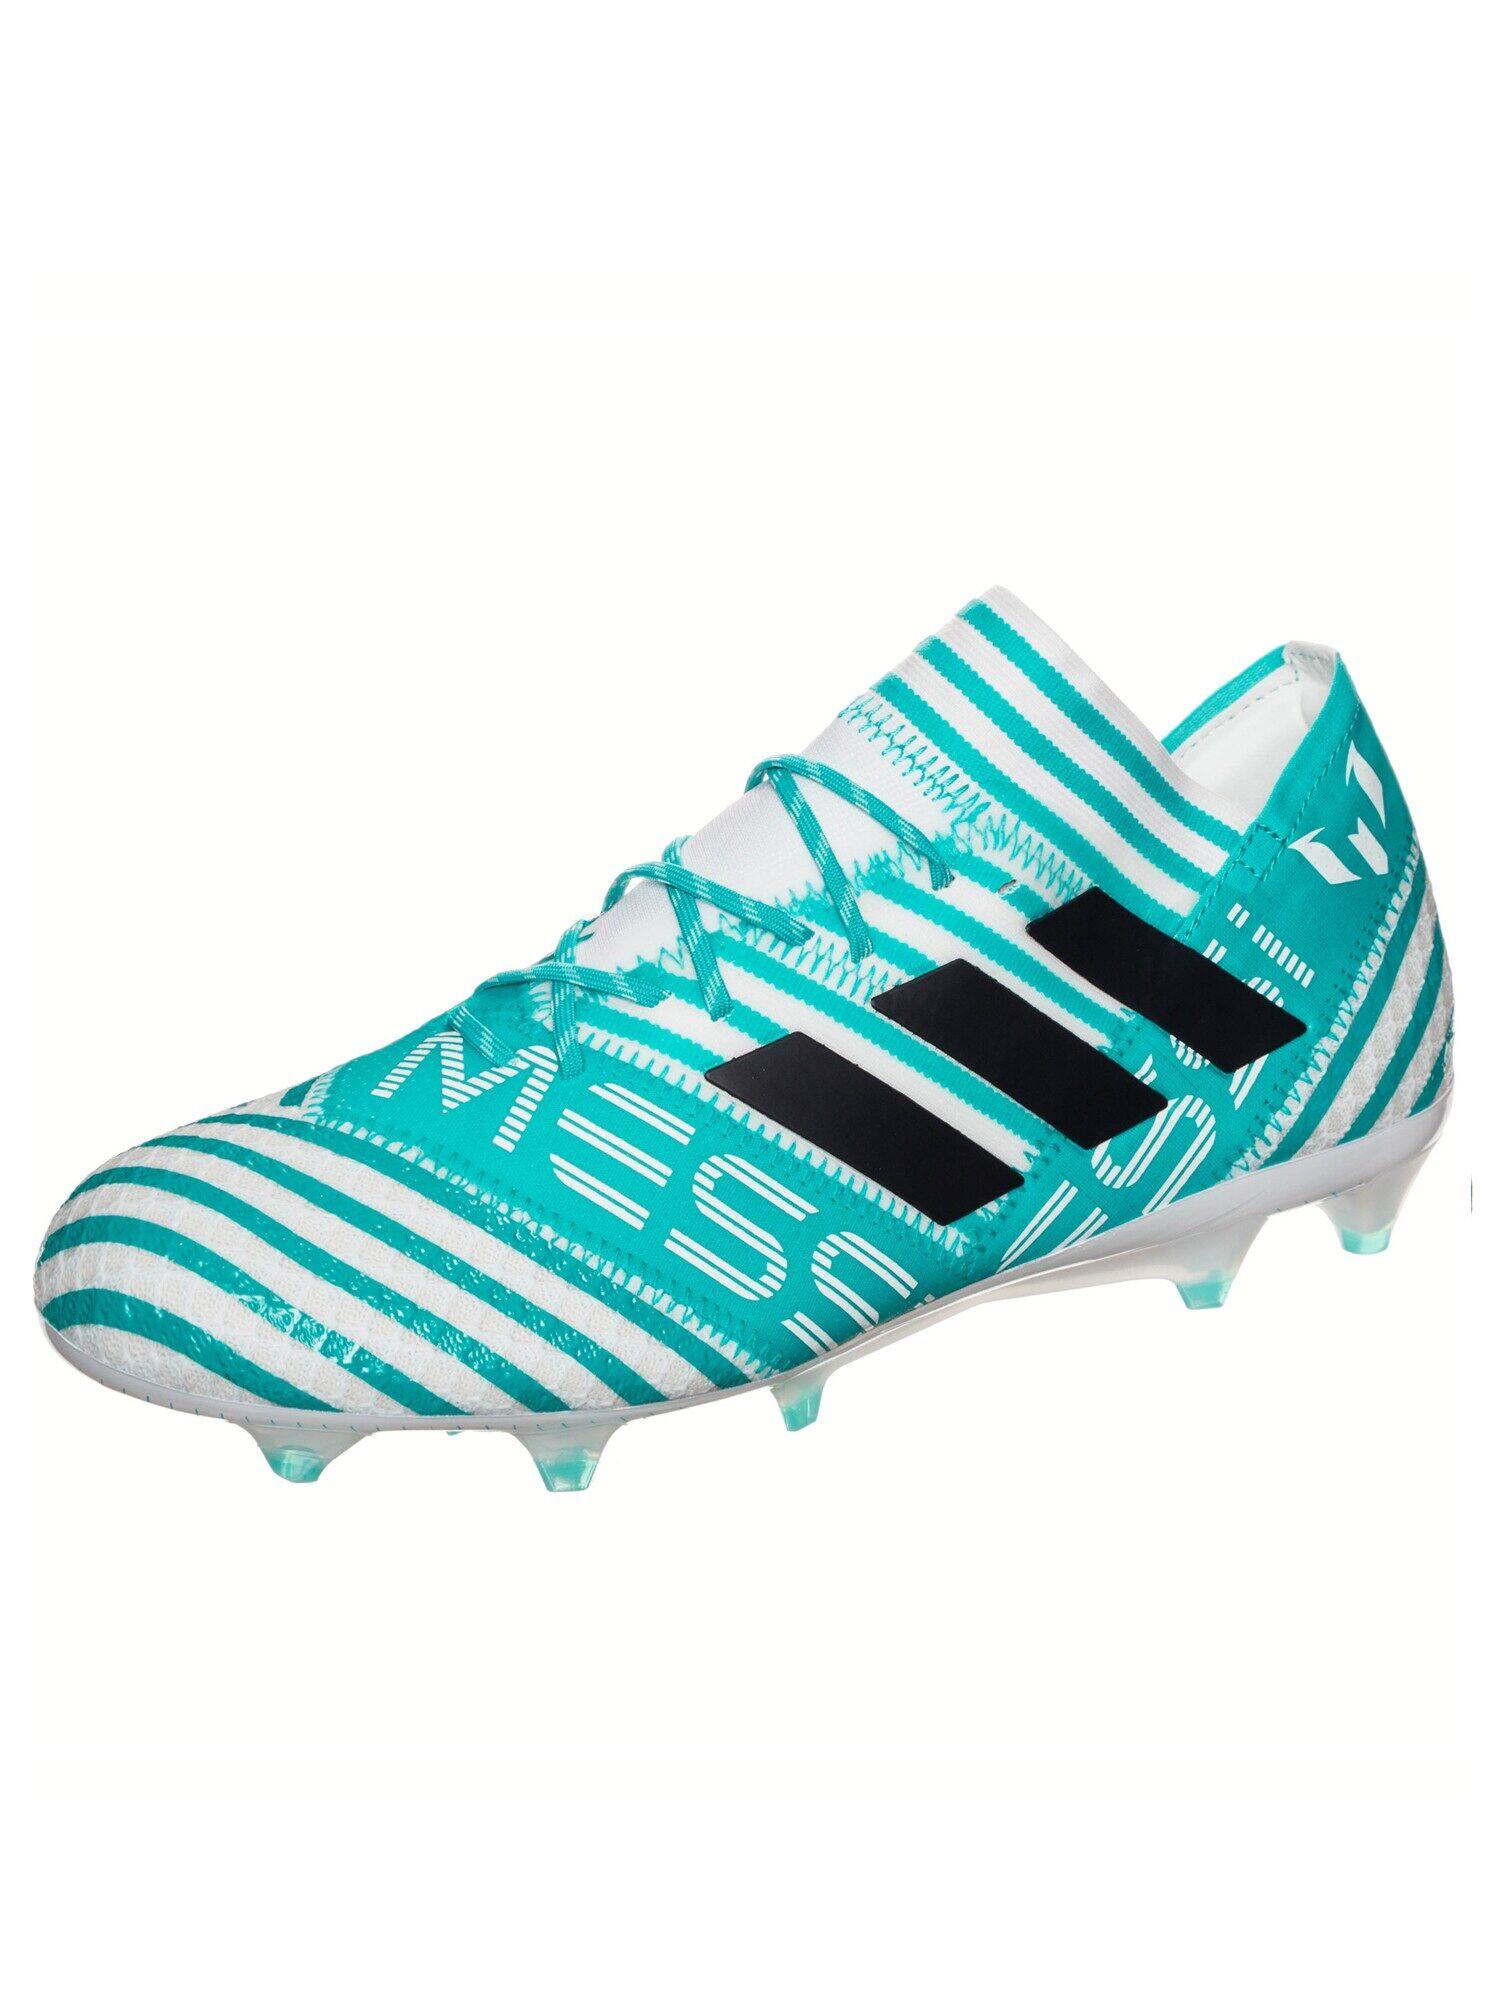 Adidas 'Nemeziz Messi 17.1 FG' Fußballschuh 41-41,5,42,44,5-45,46,5-47